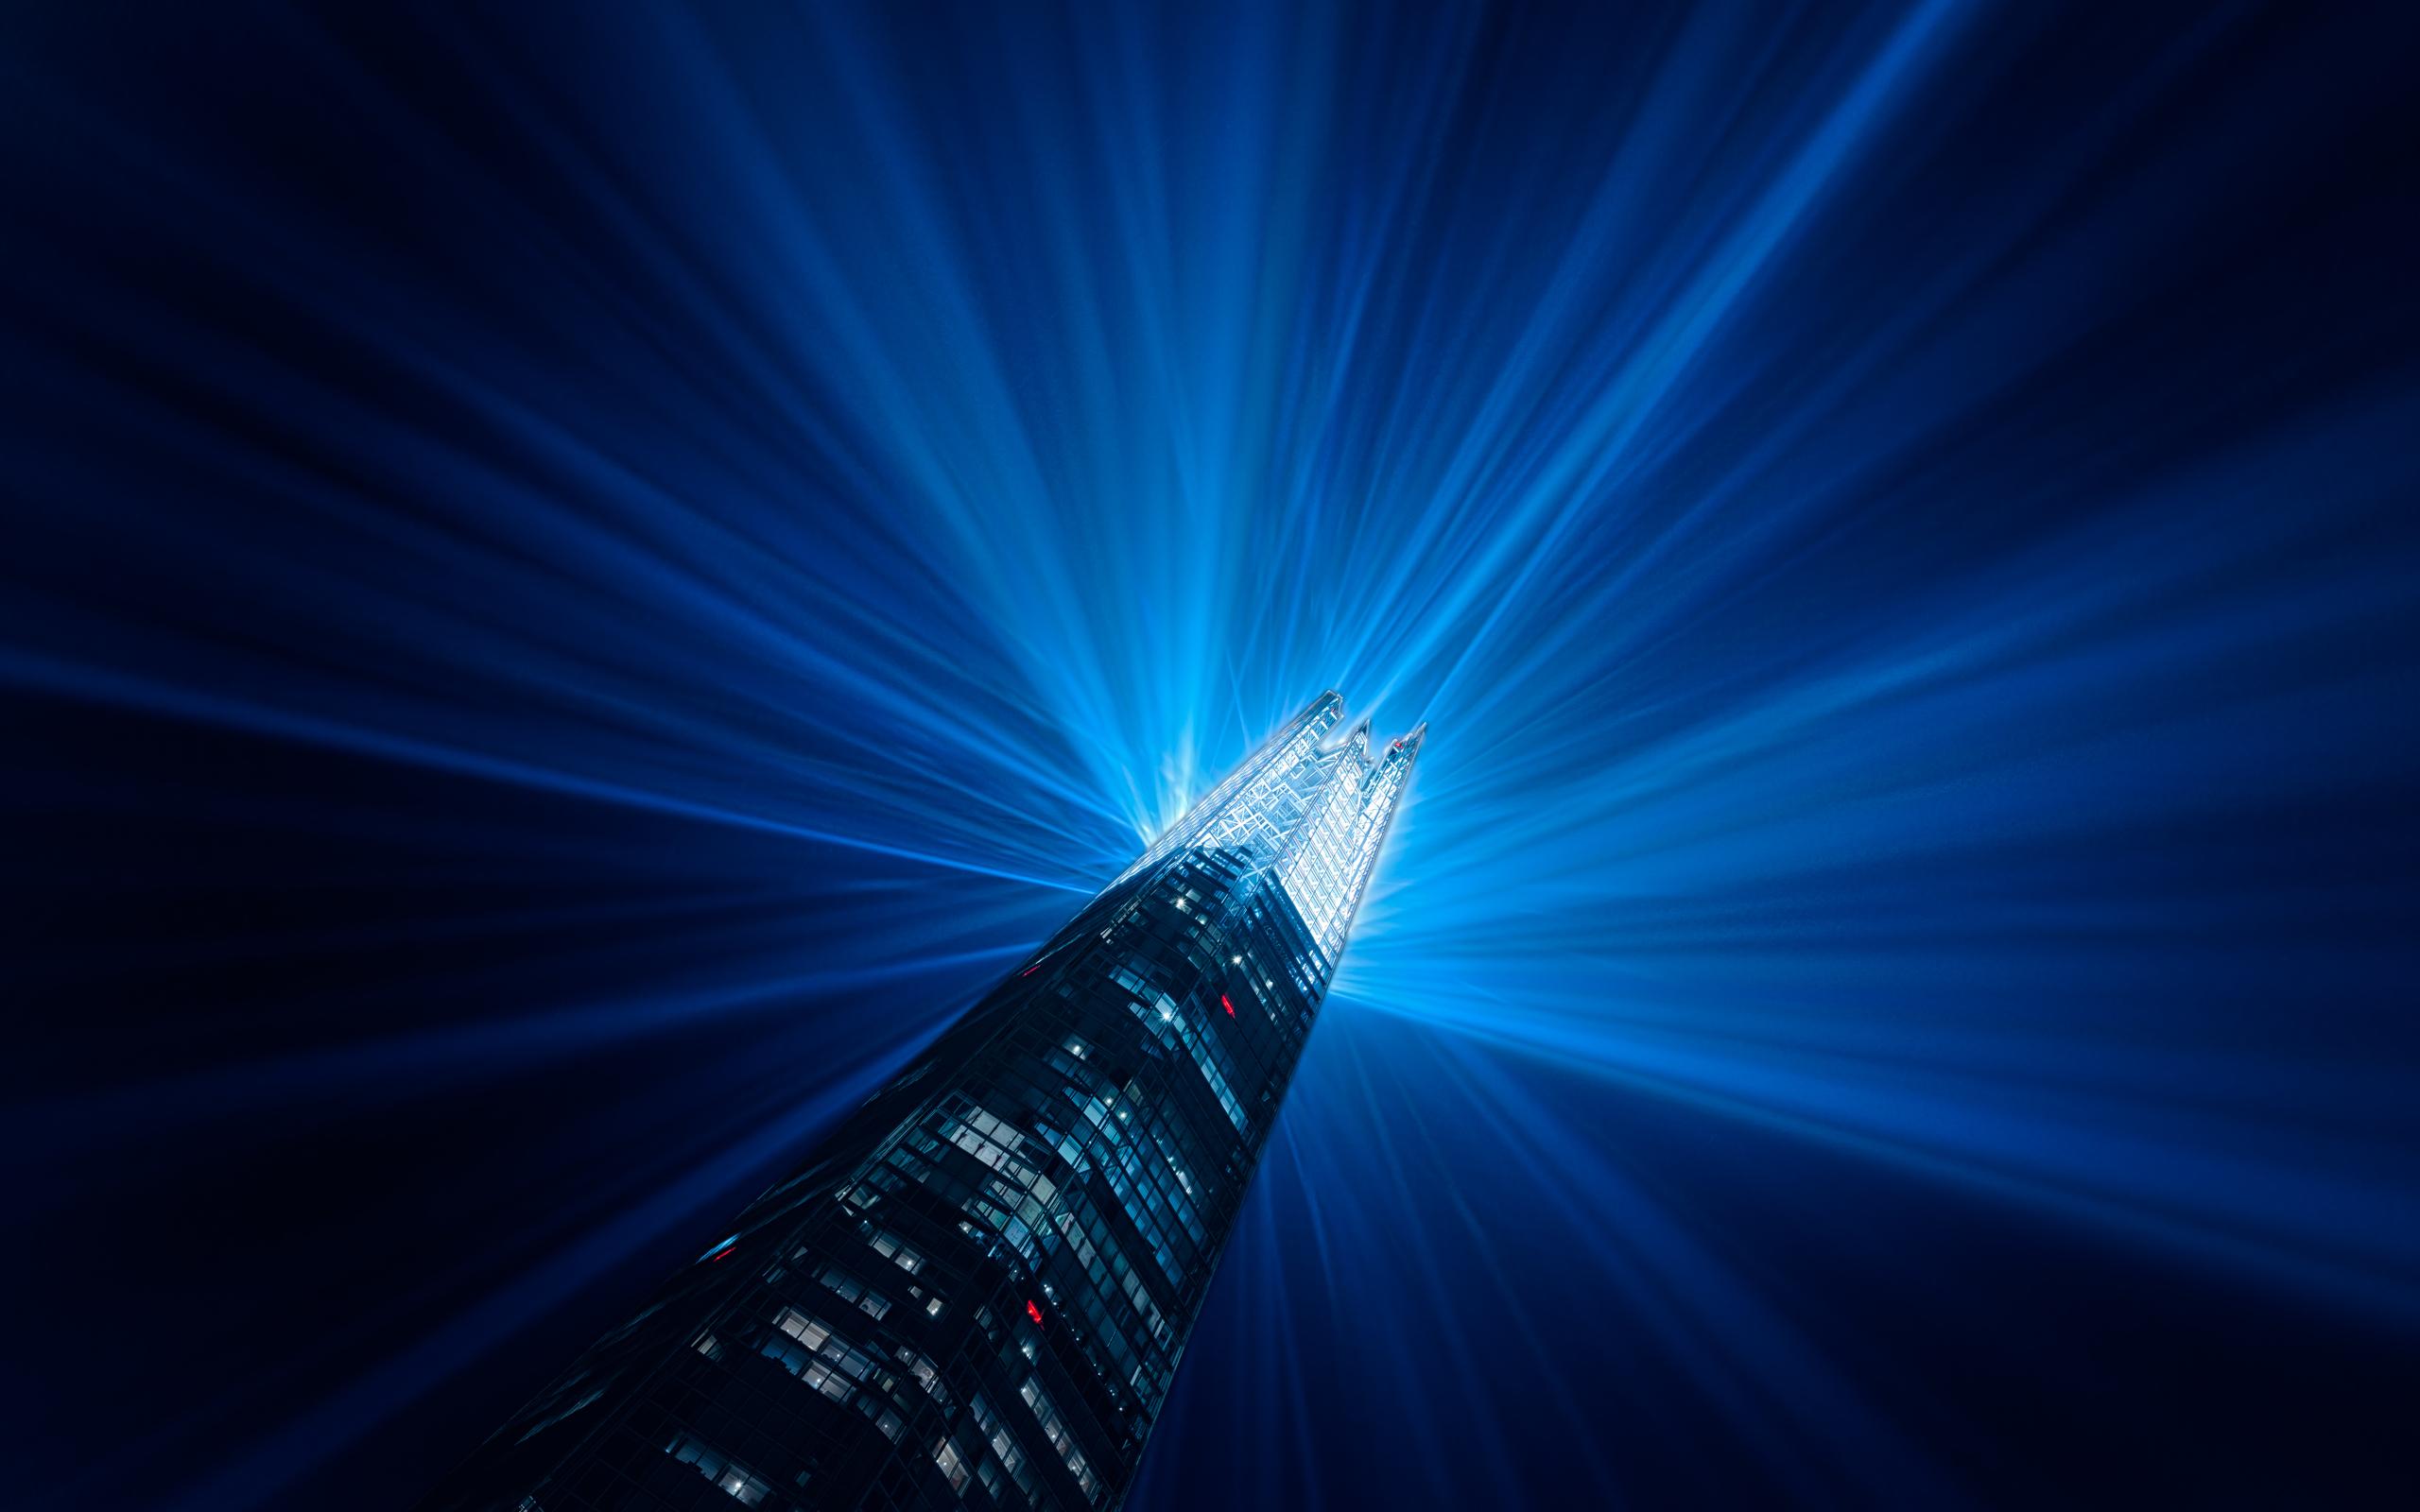 london-skyscraper-8k-jm.jpg